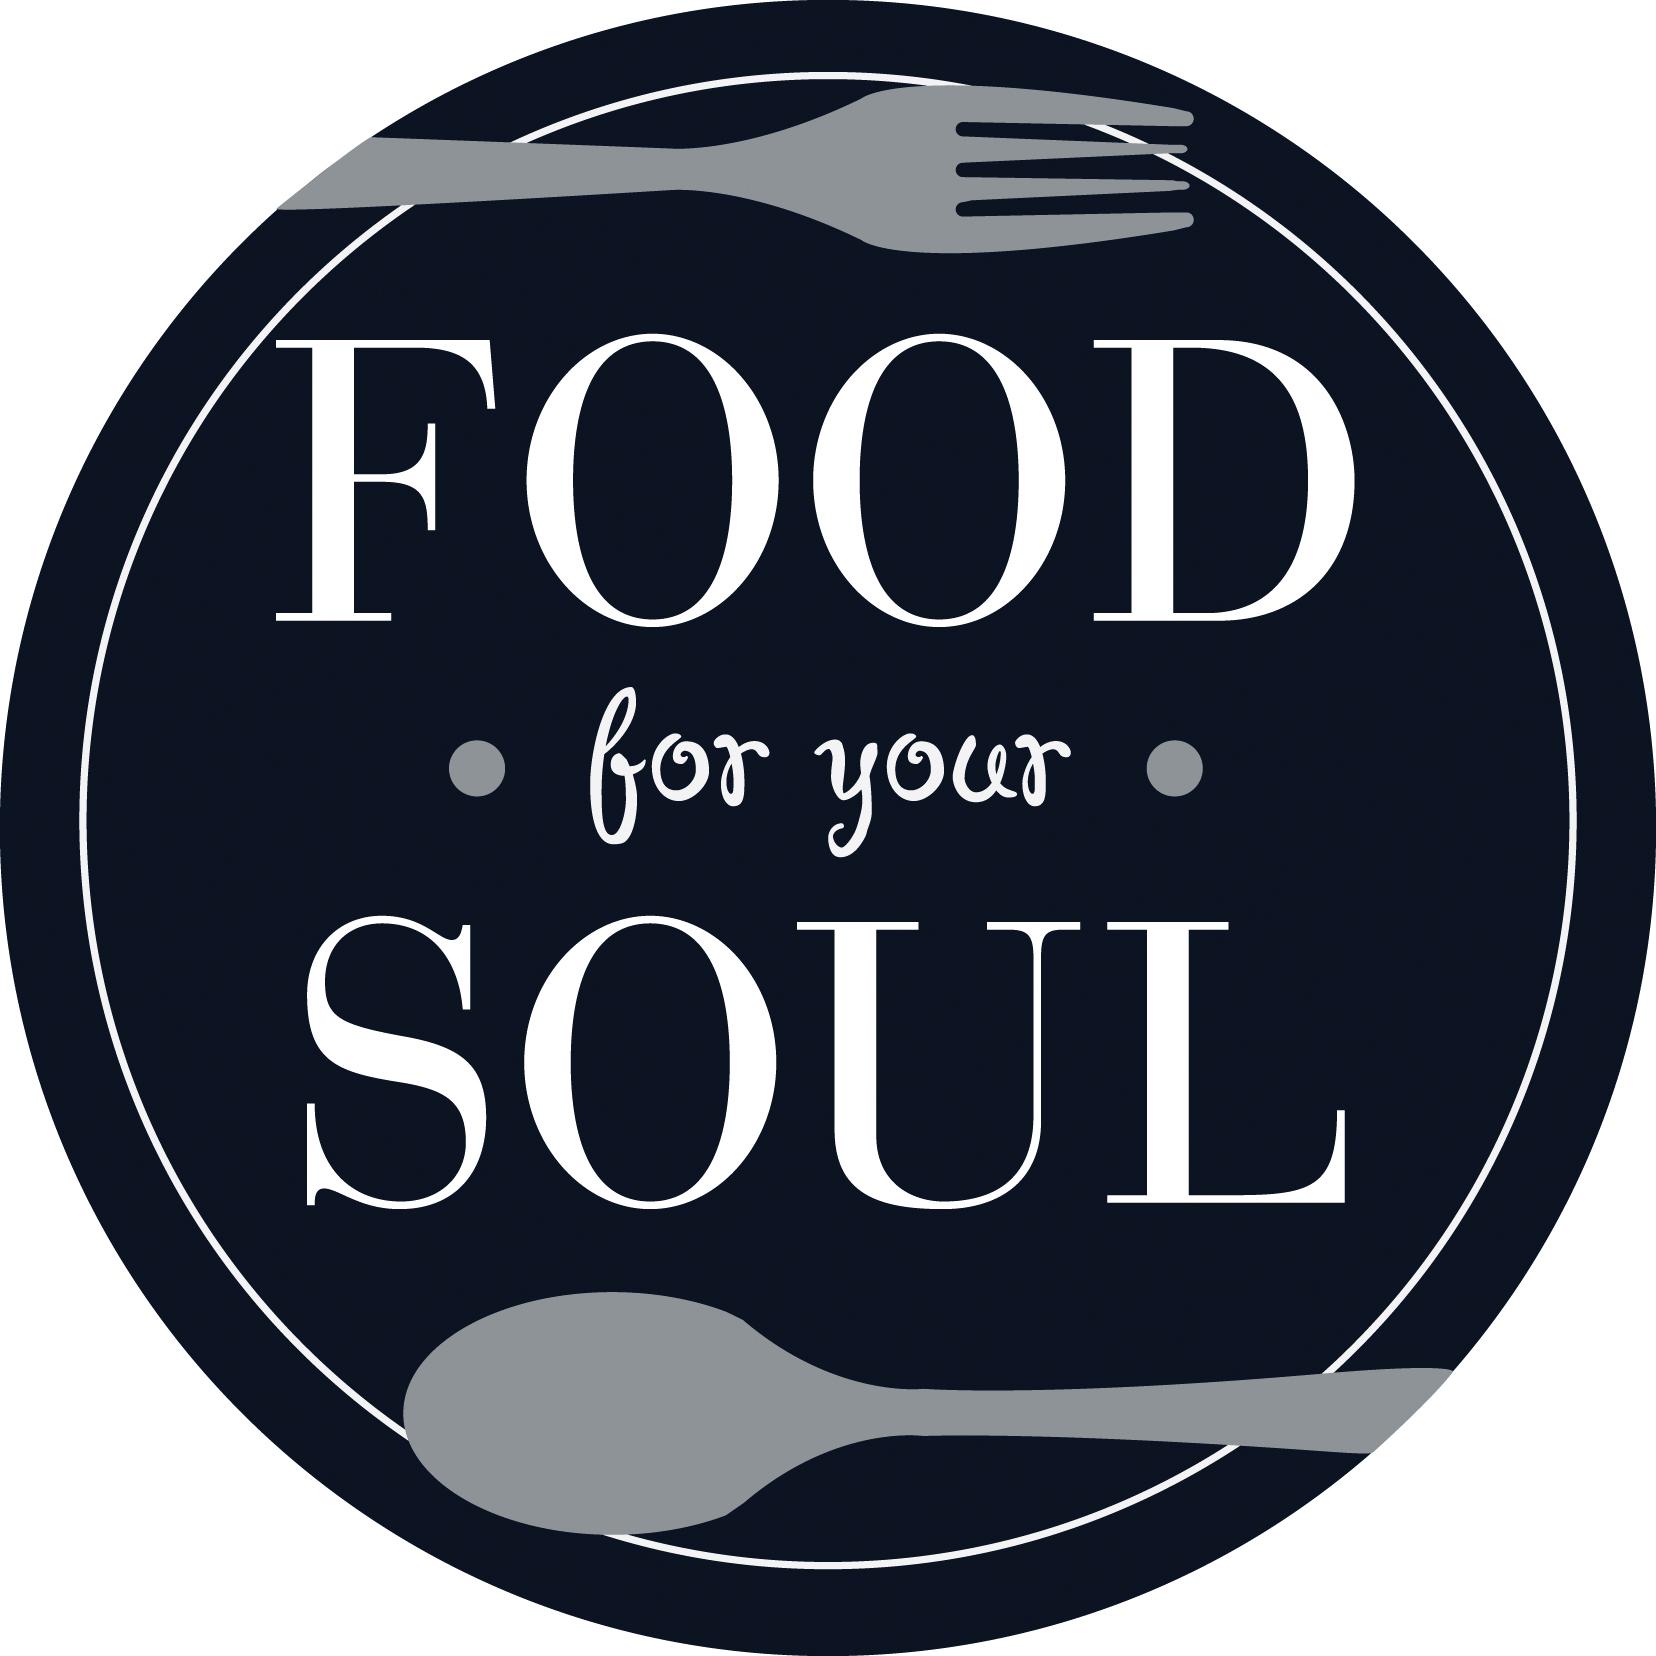 Soul food clipart images.